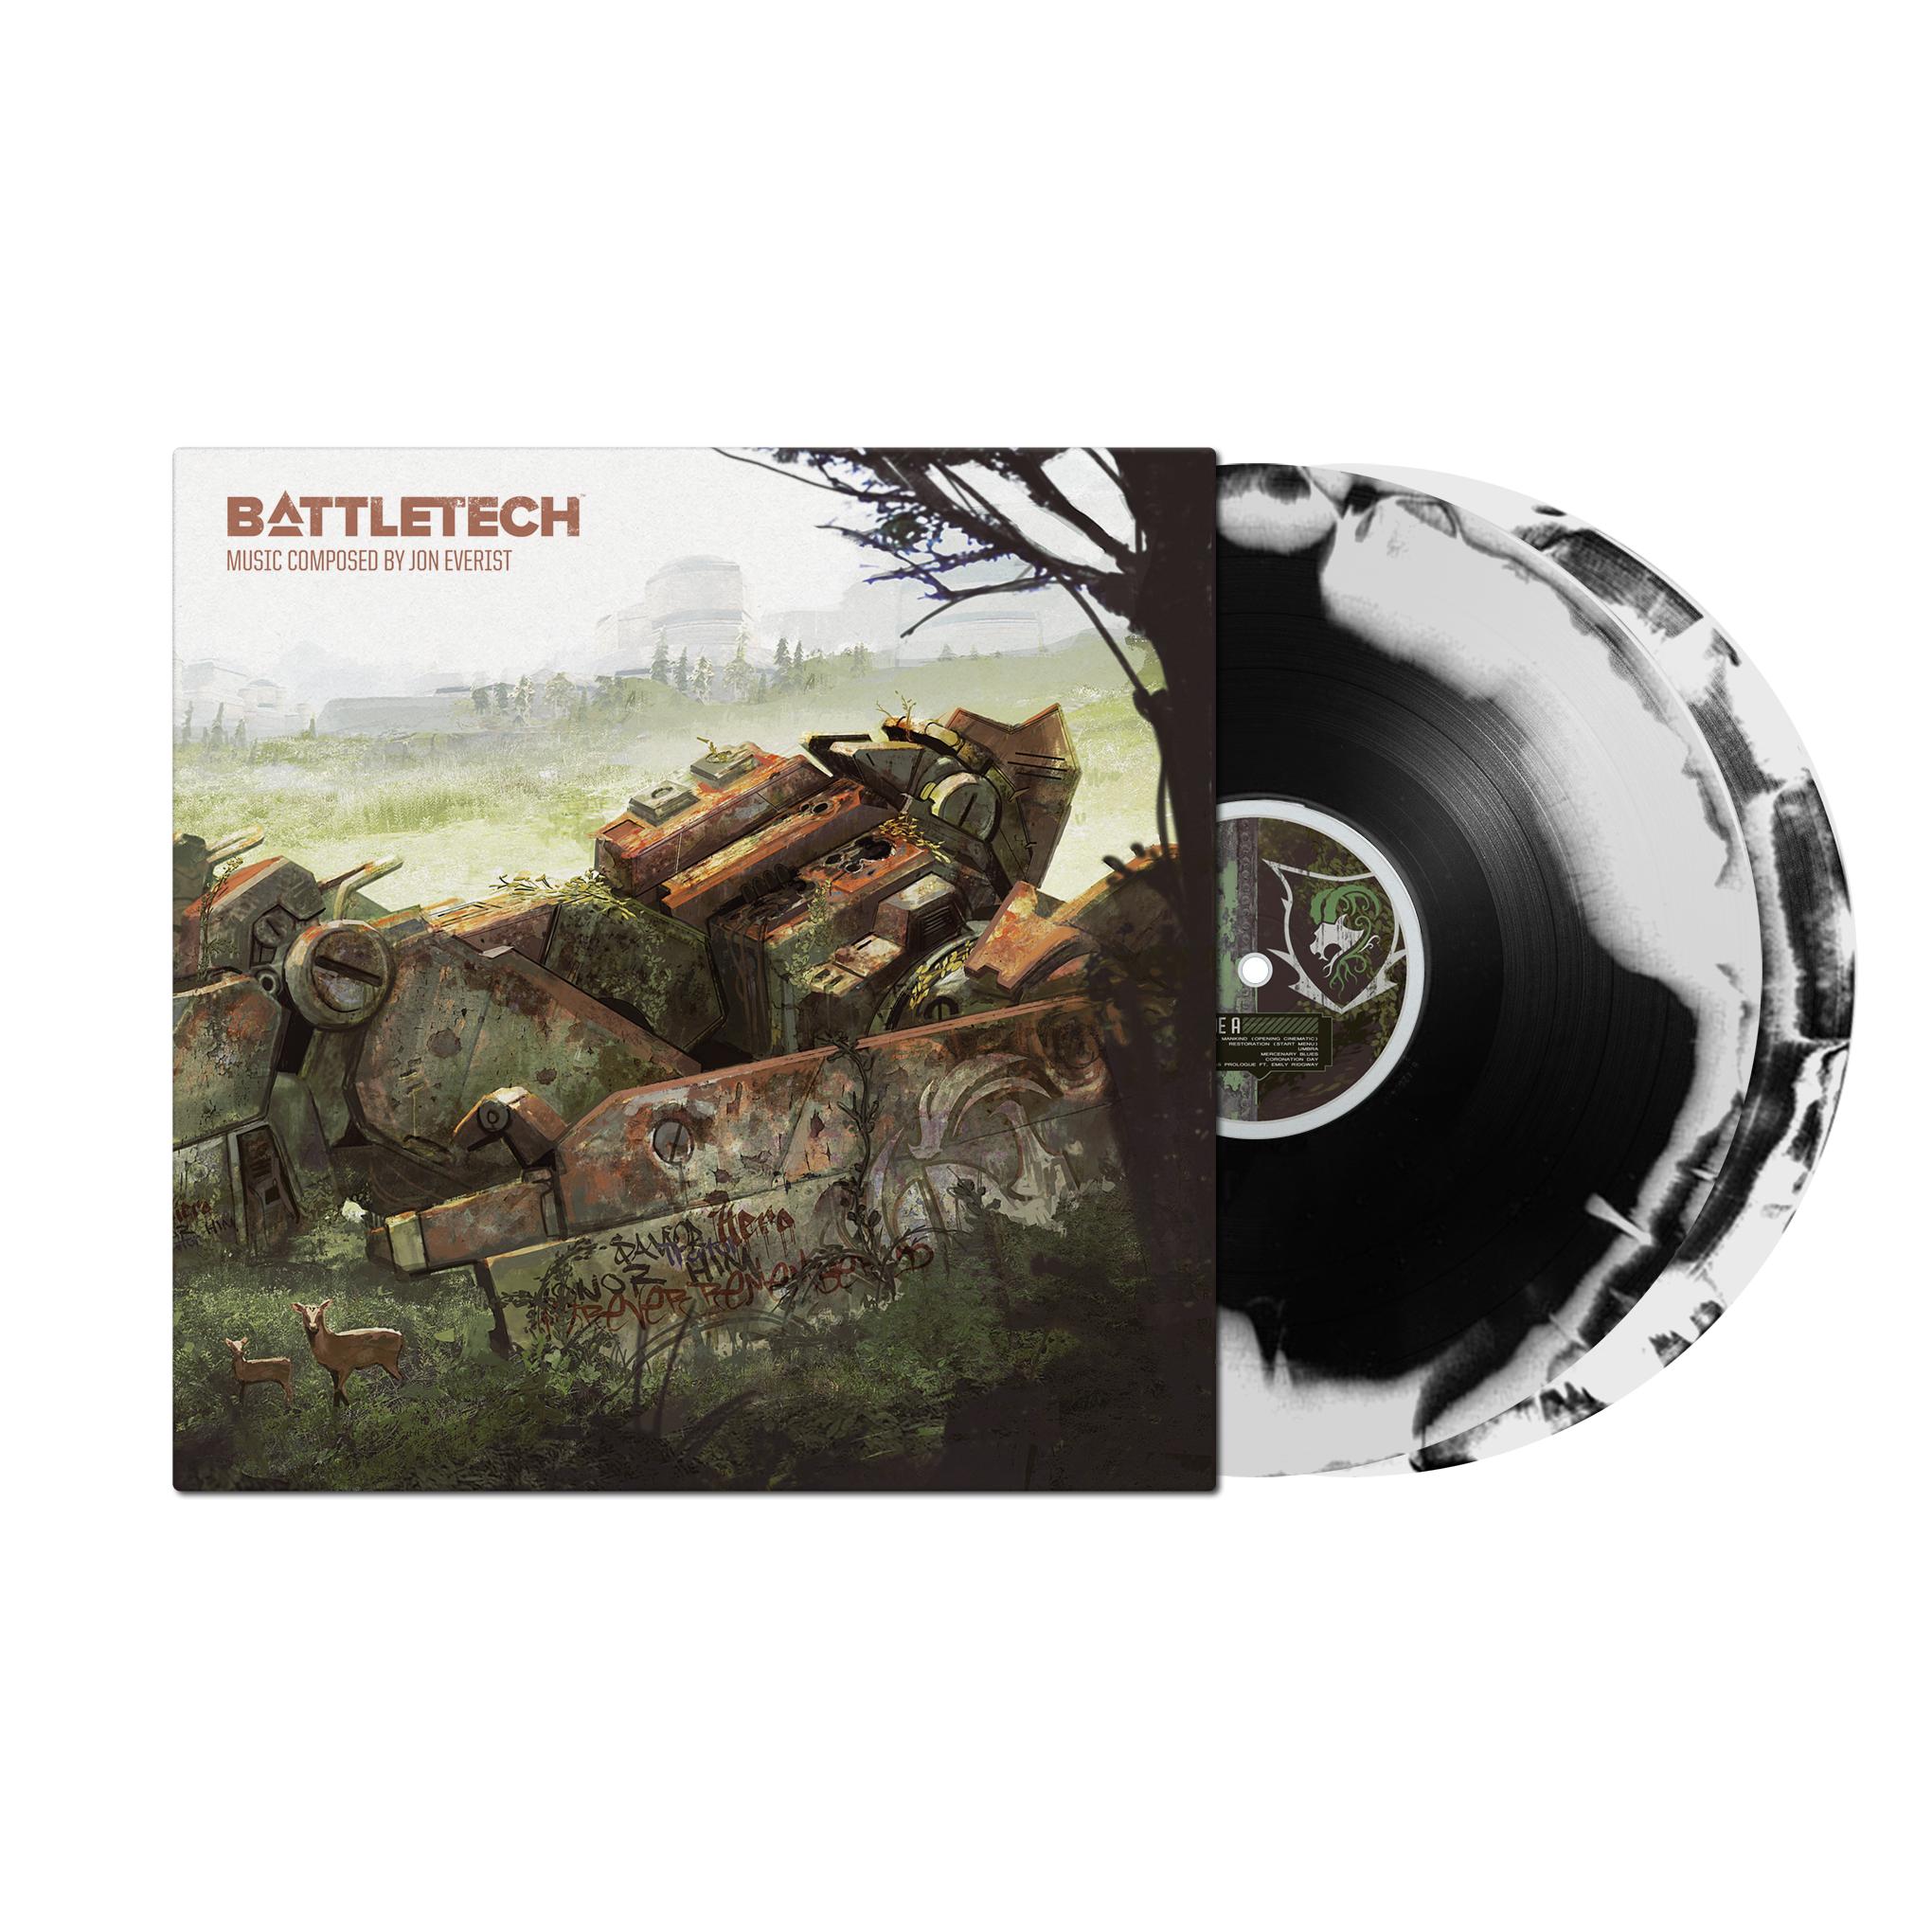 BattleTech: Original Game Soundtrack